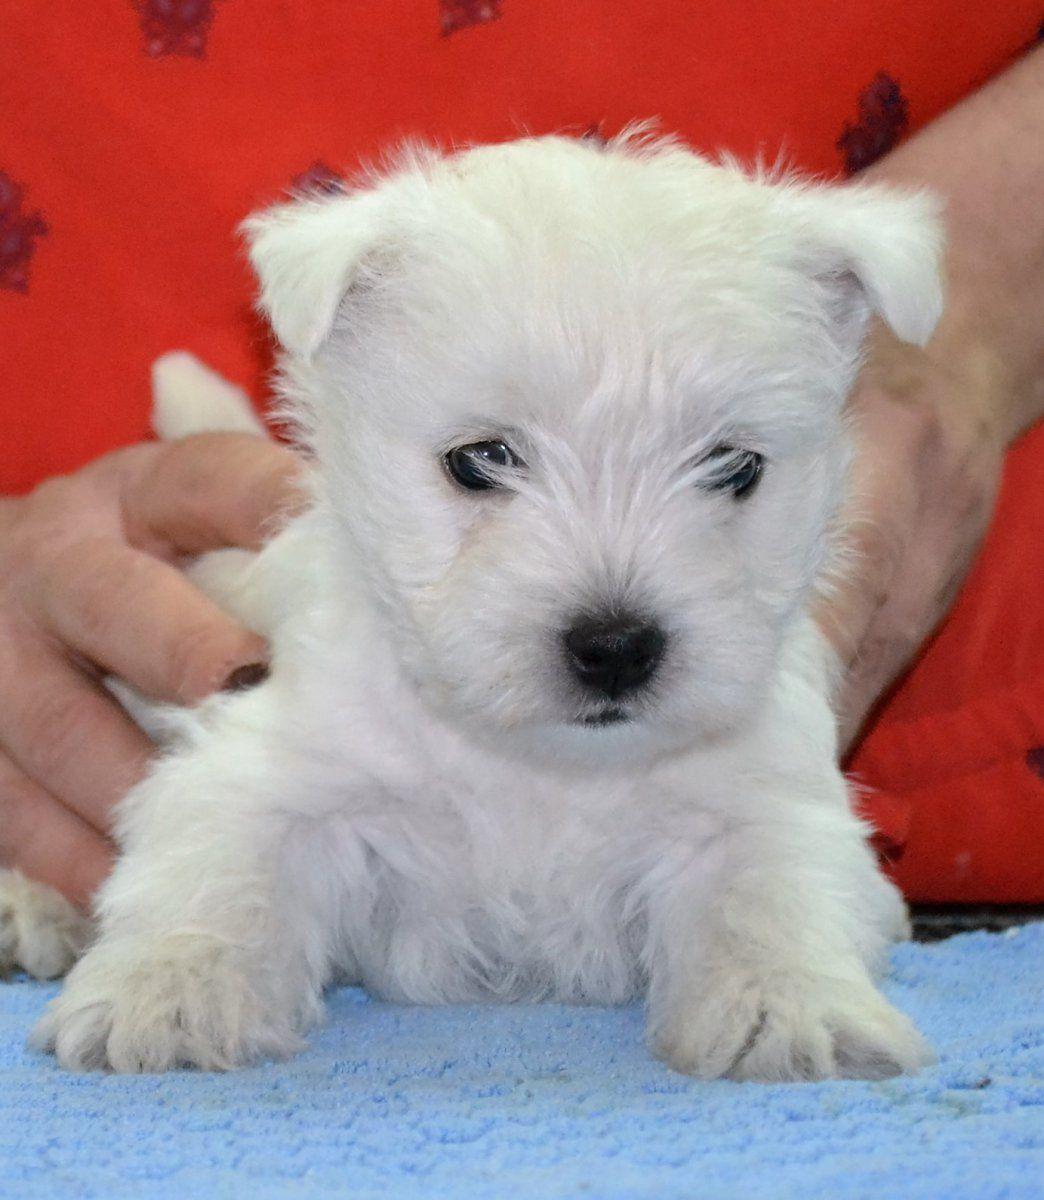 b b s westies acheter un chiot west highland white terrier 03 allier france eleveurs. Black Bedroom Furniture Sets. Home Design Ideas